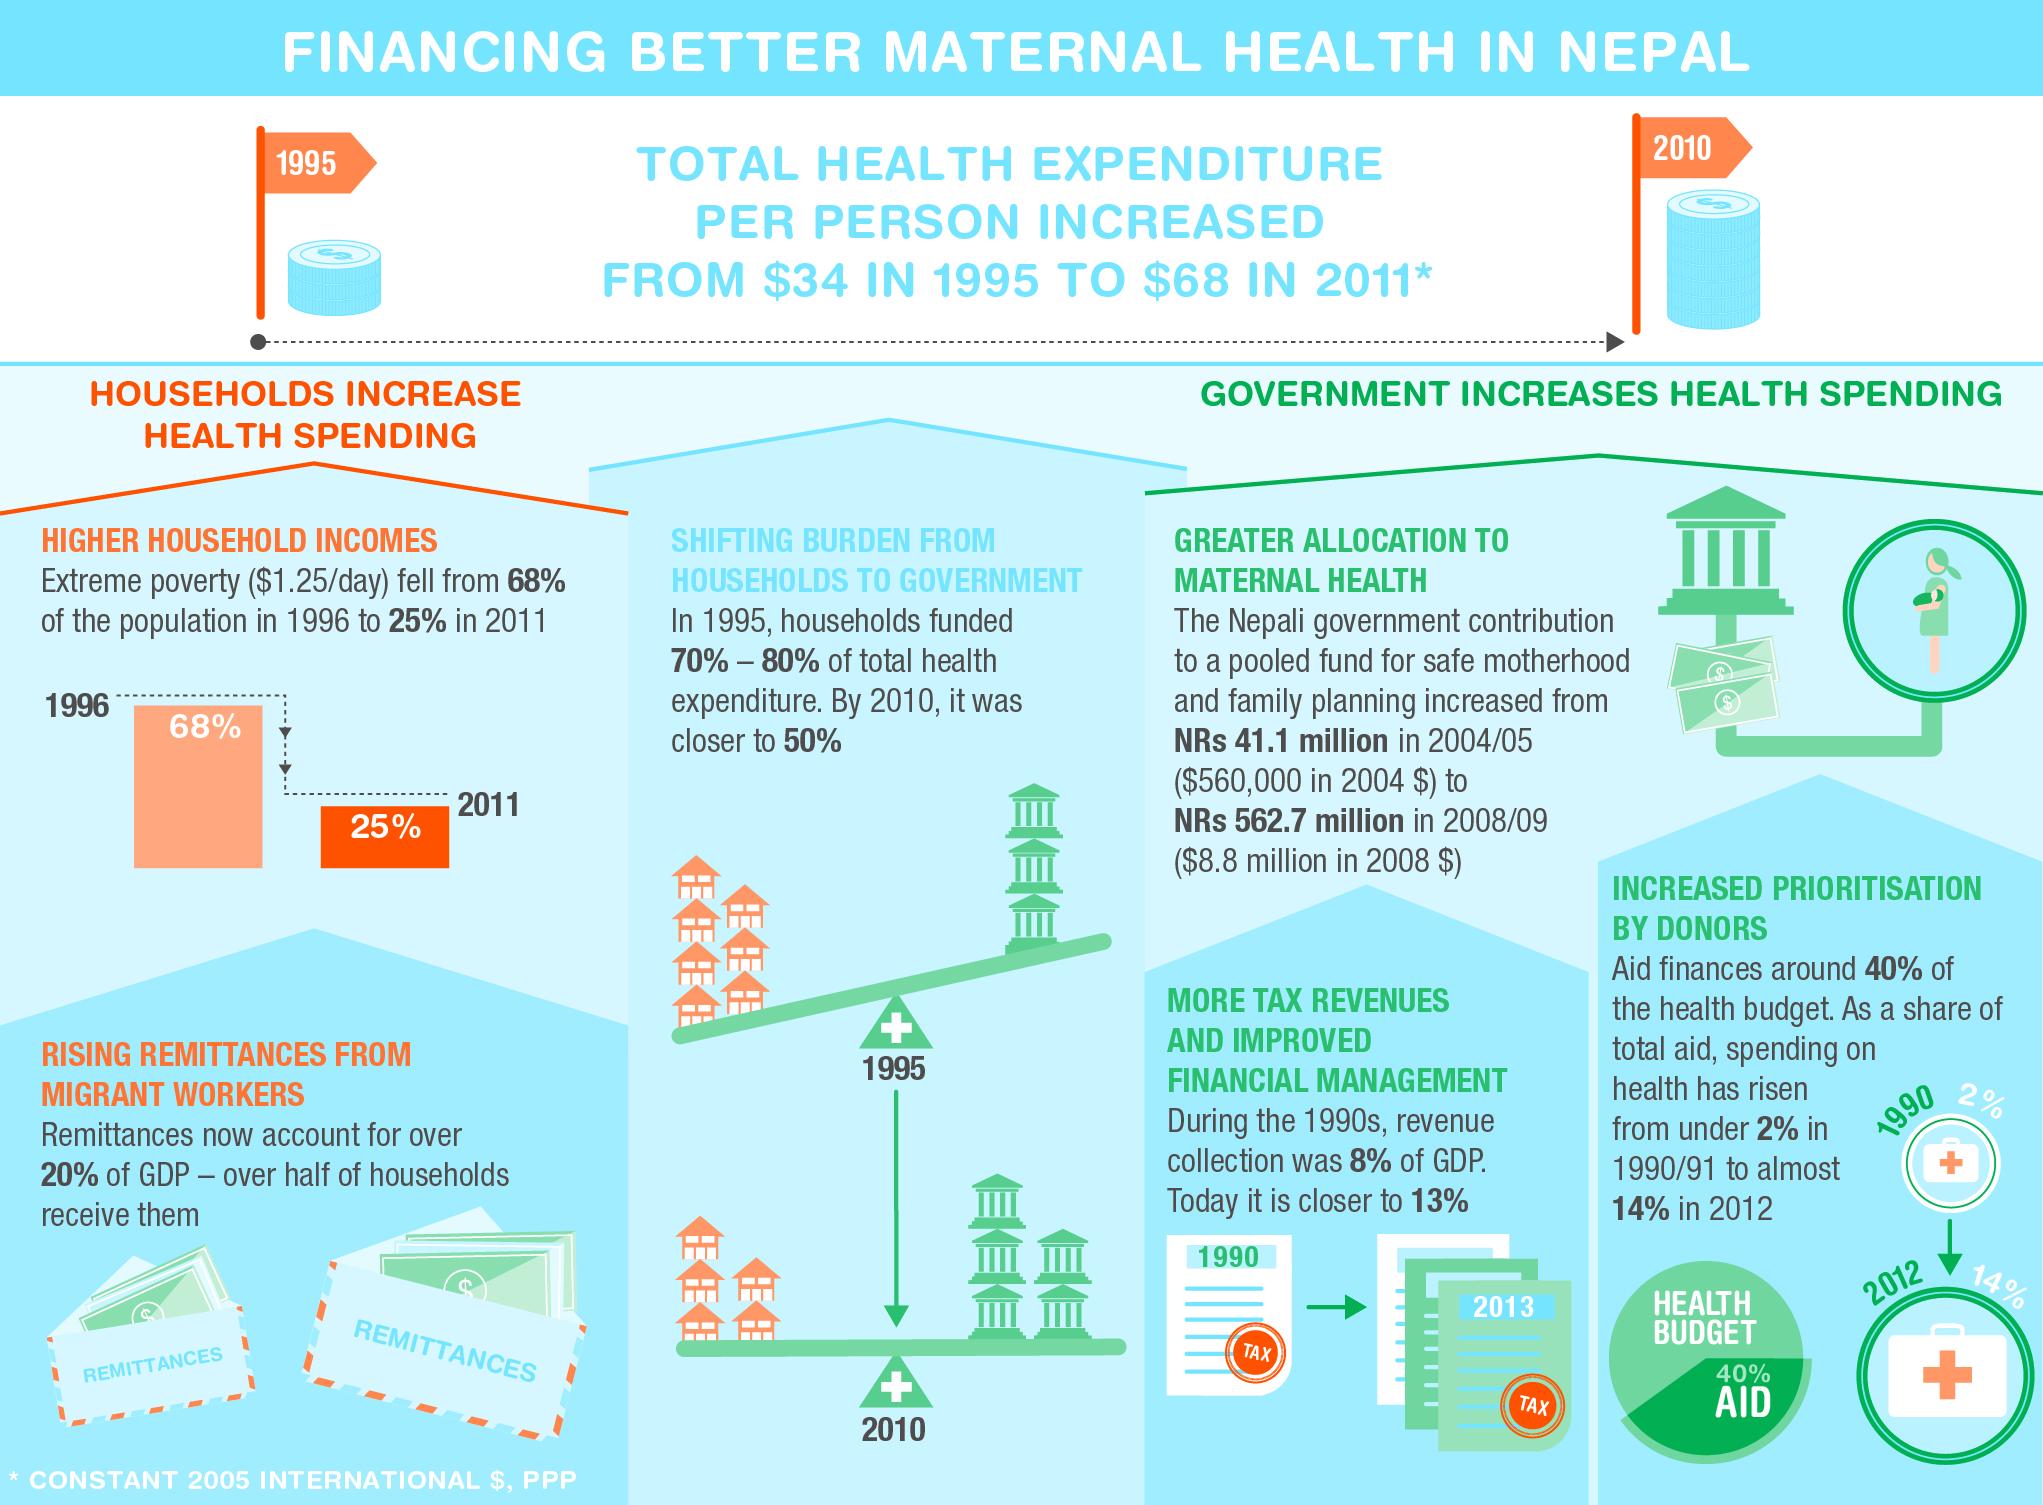 financing-better-maternal-health-in-nepal_5264fabd1cc3f